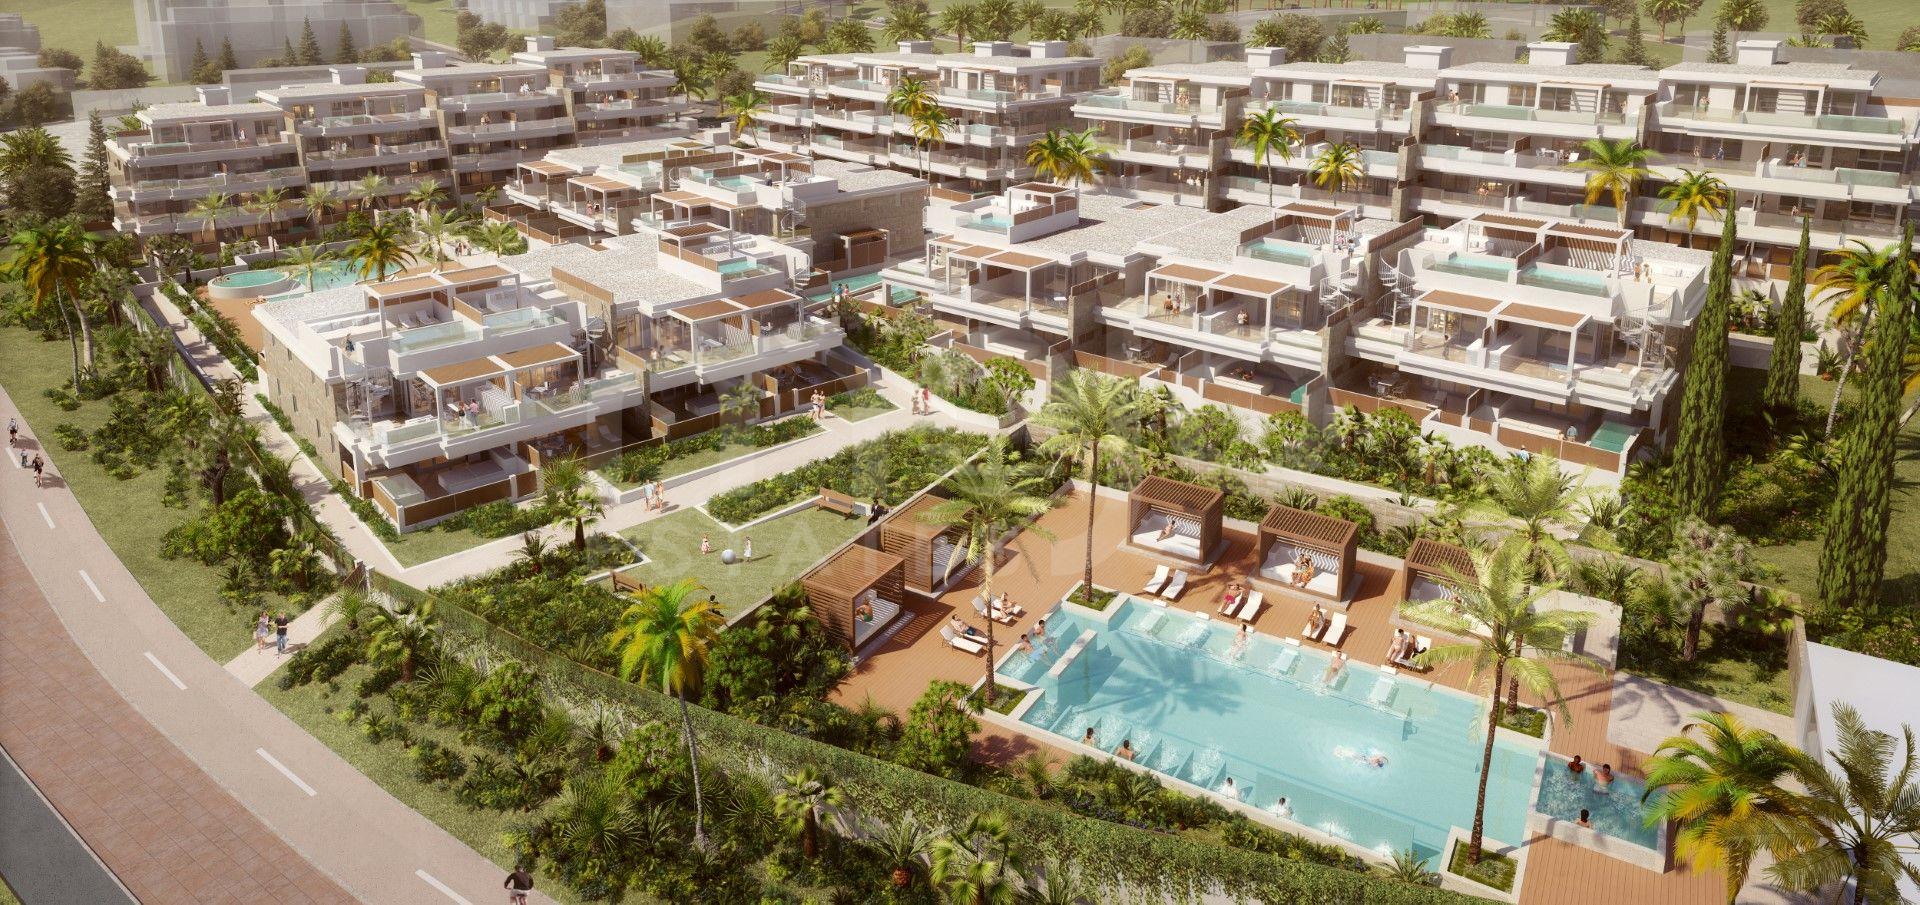 Appartement Terrasse à vendre dans Cala de Mijas, Mijas Costa